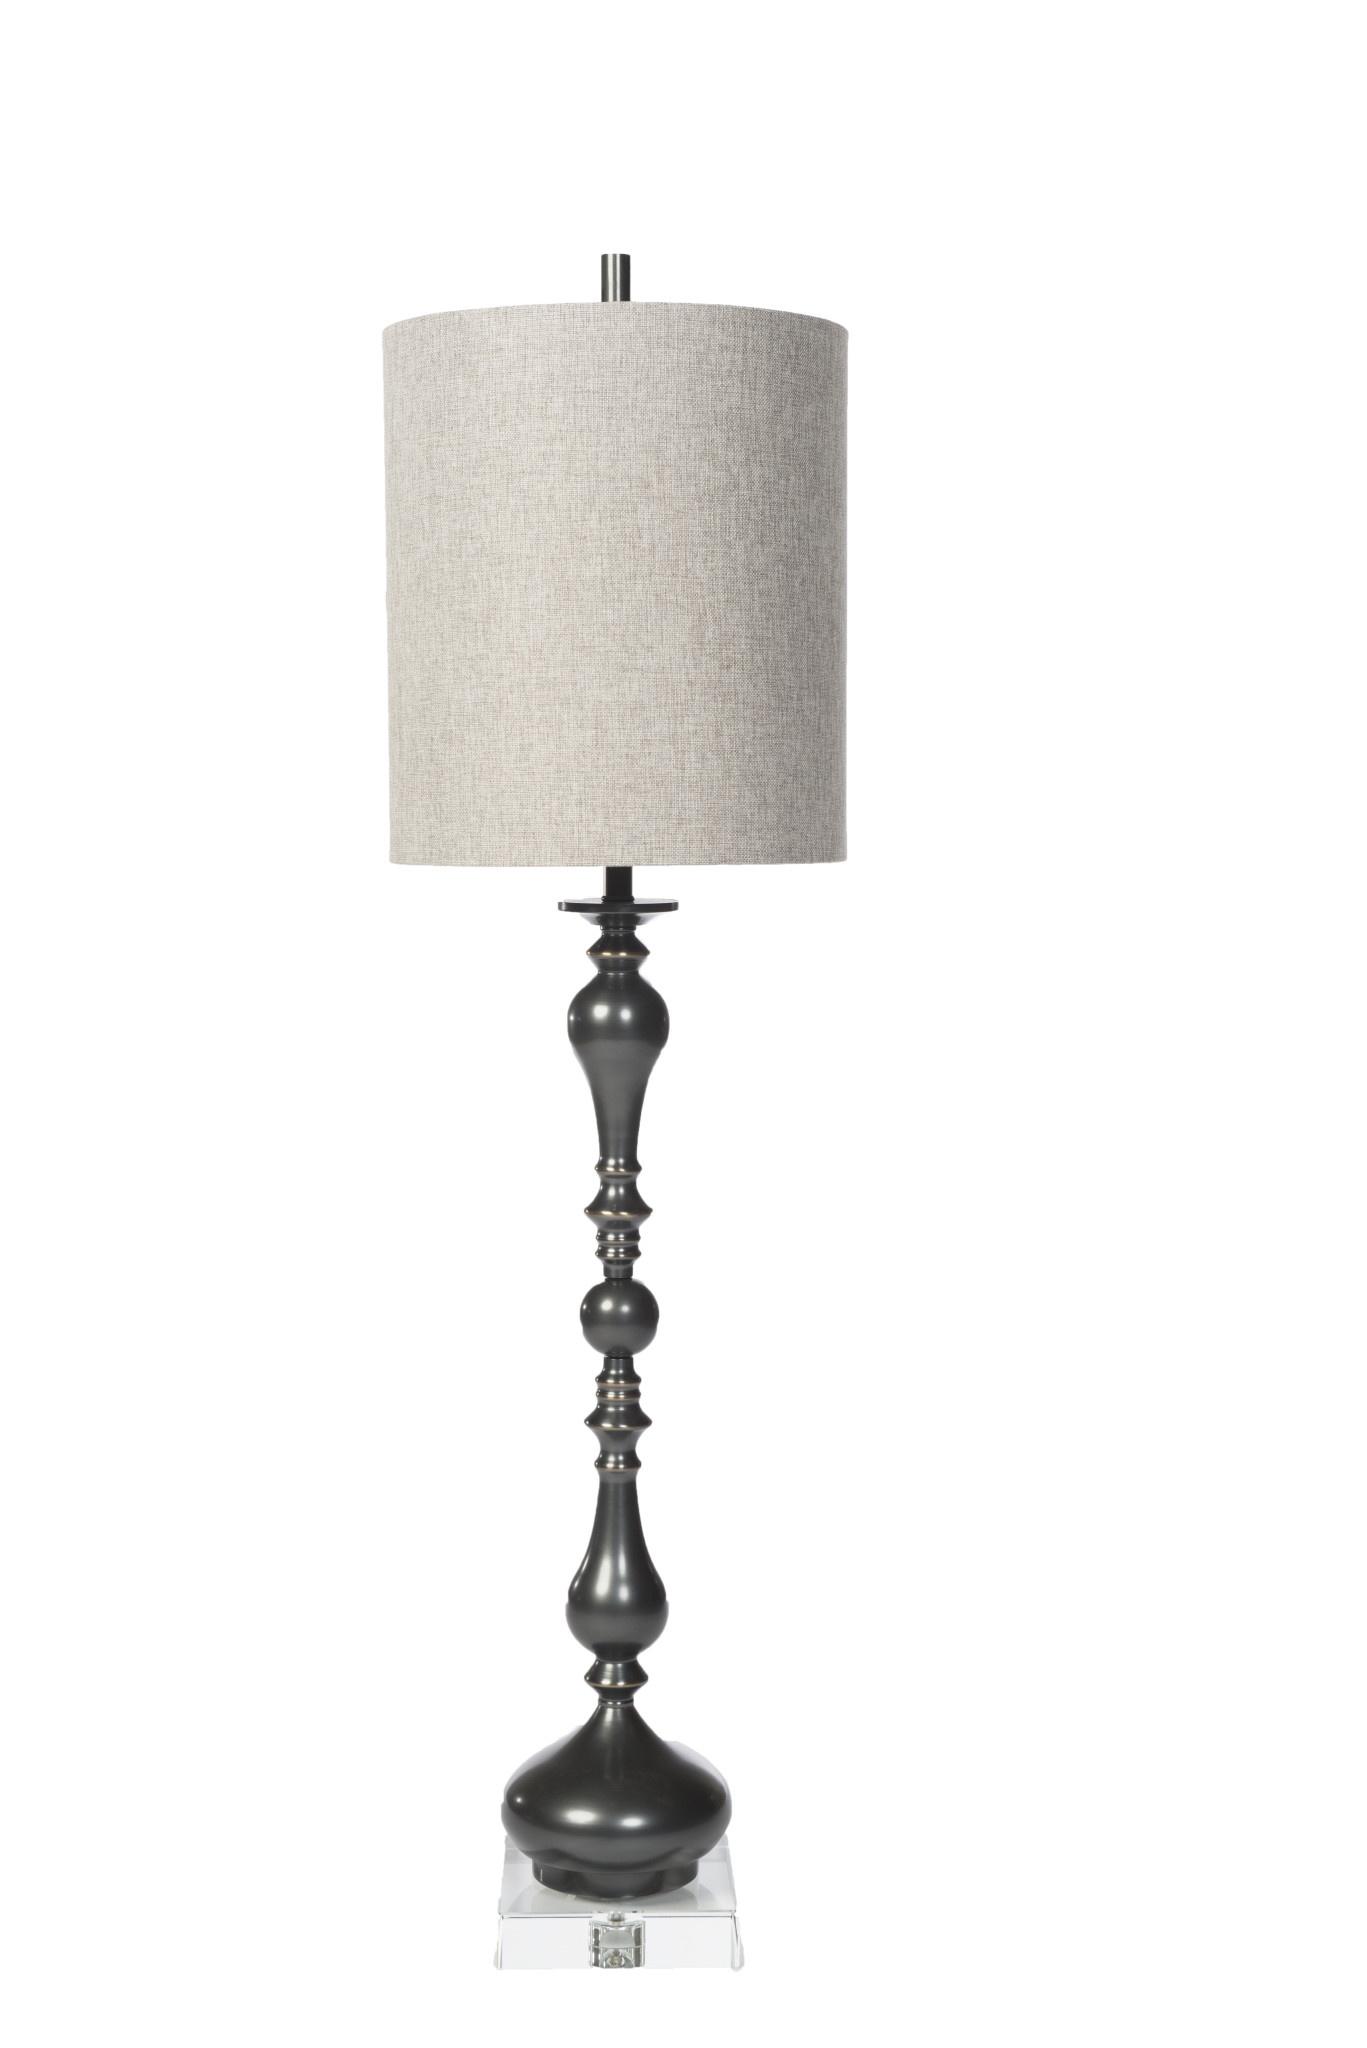 VANDERBILT LAMP - disc